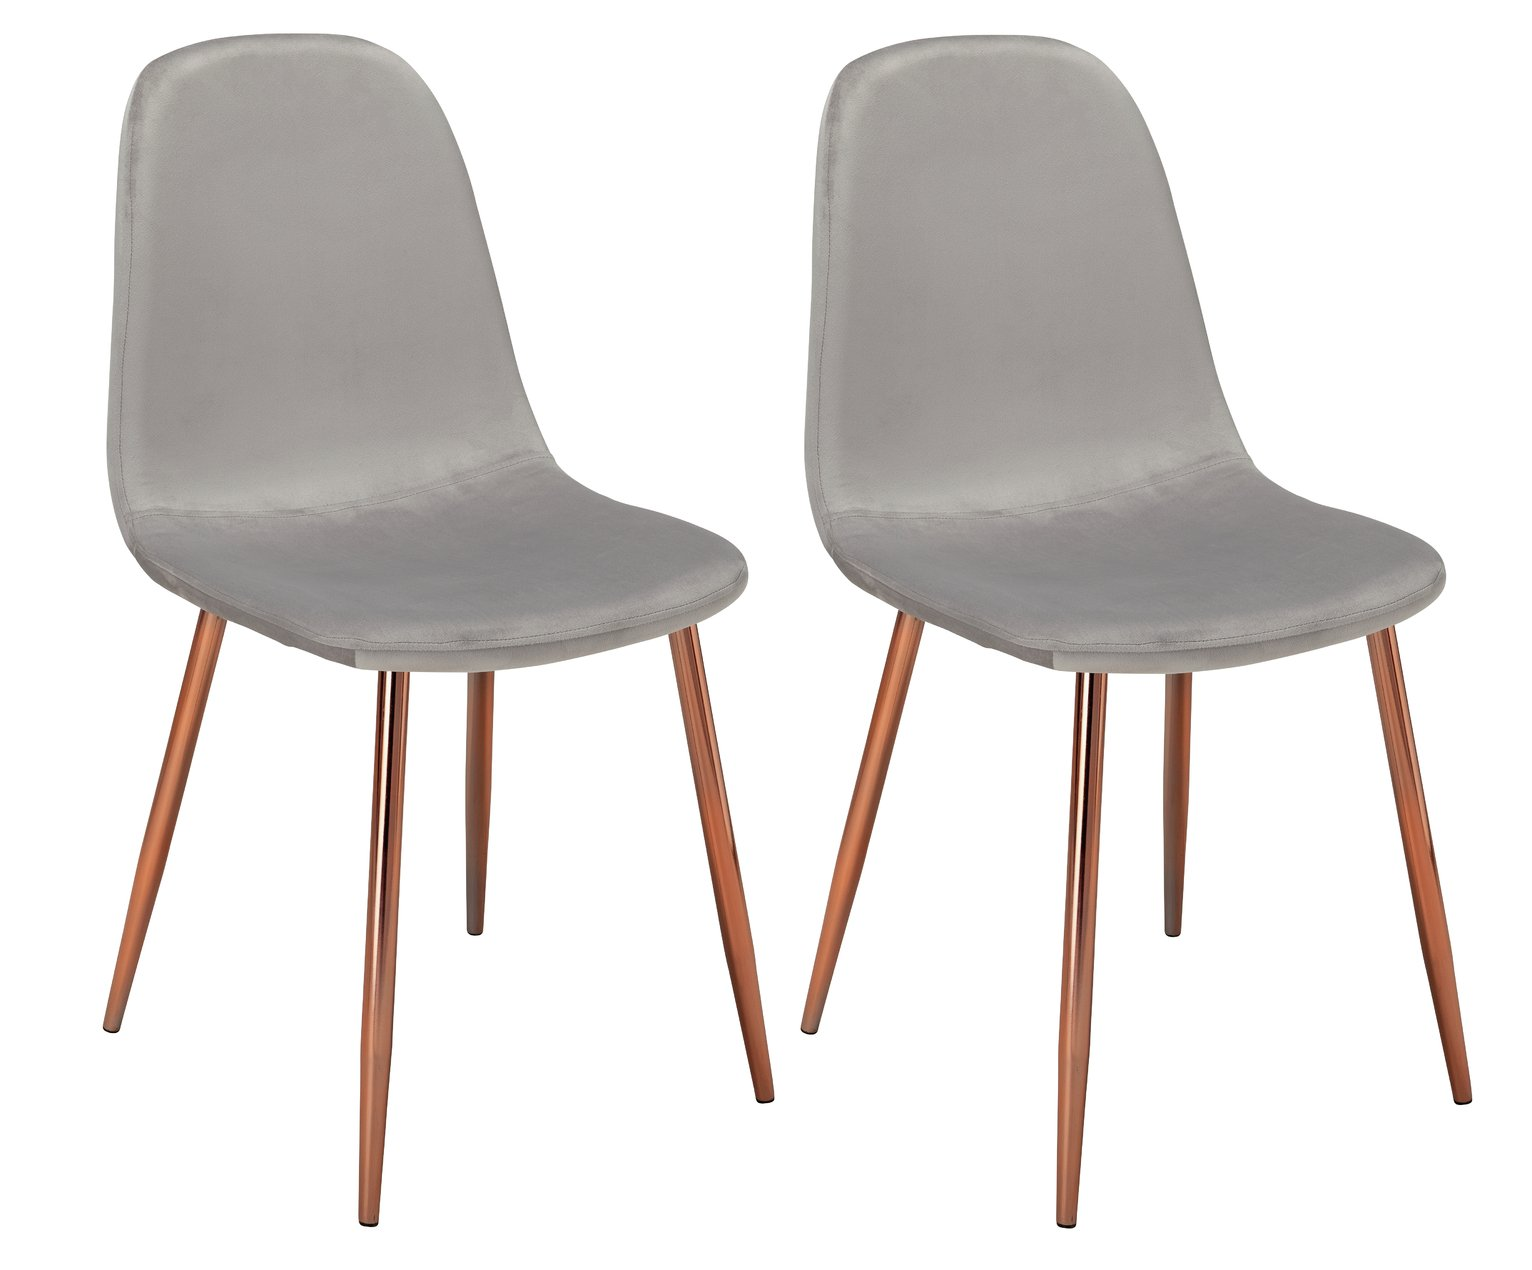 Argos Home Beni Pair of Velvet Dining Chairs - Grey